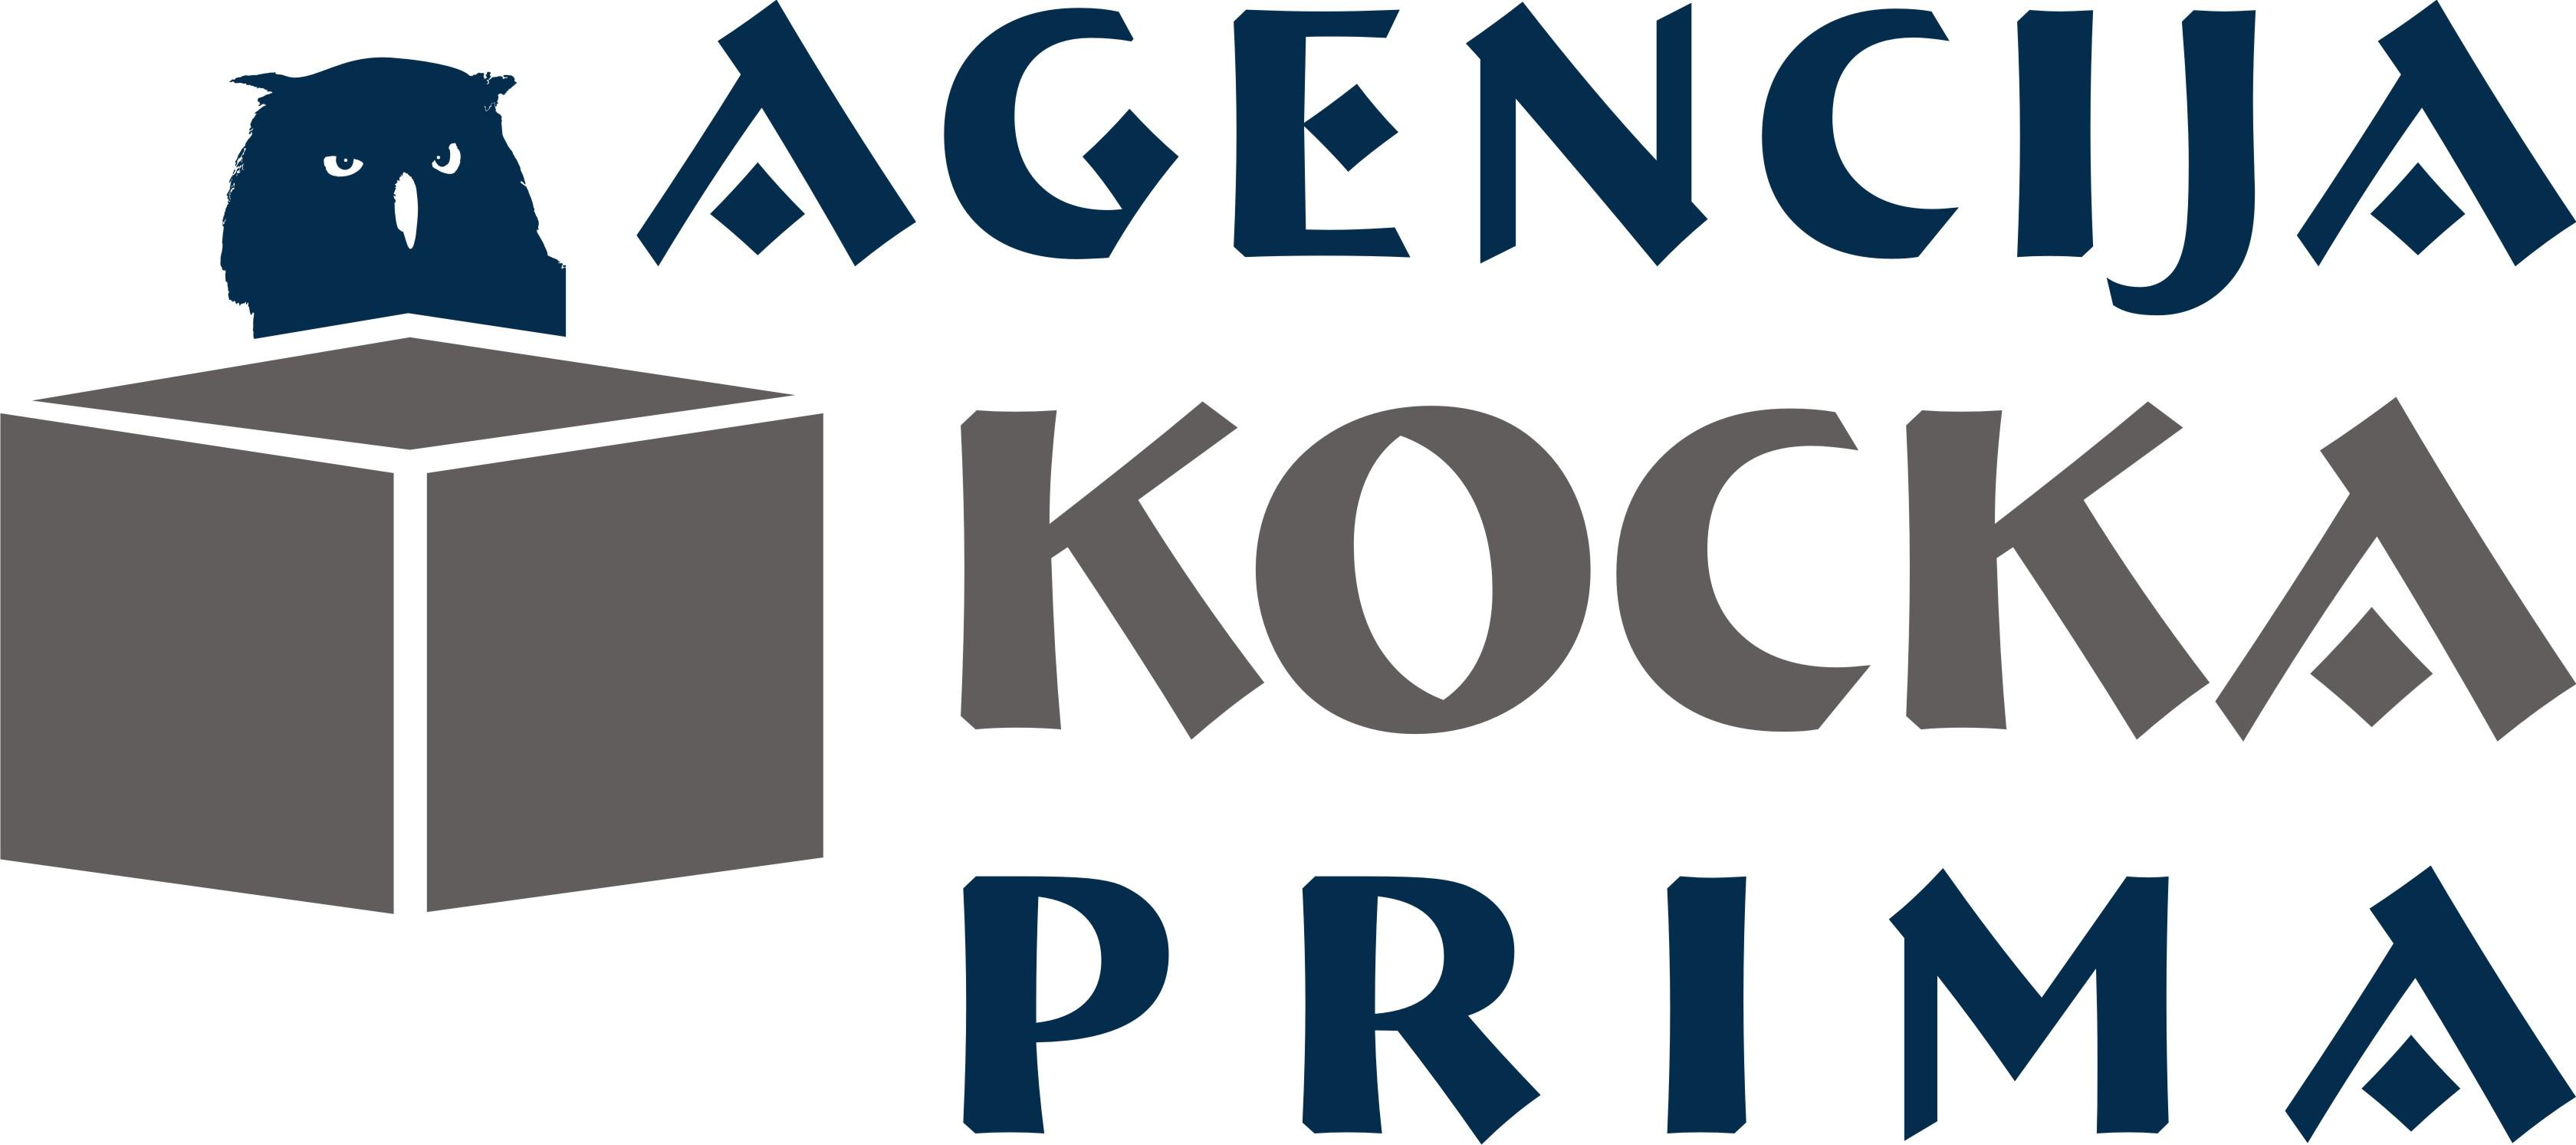 Logotip_Agencija kocka prima